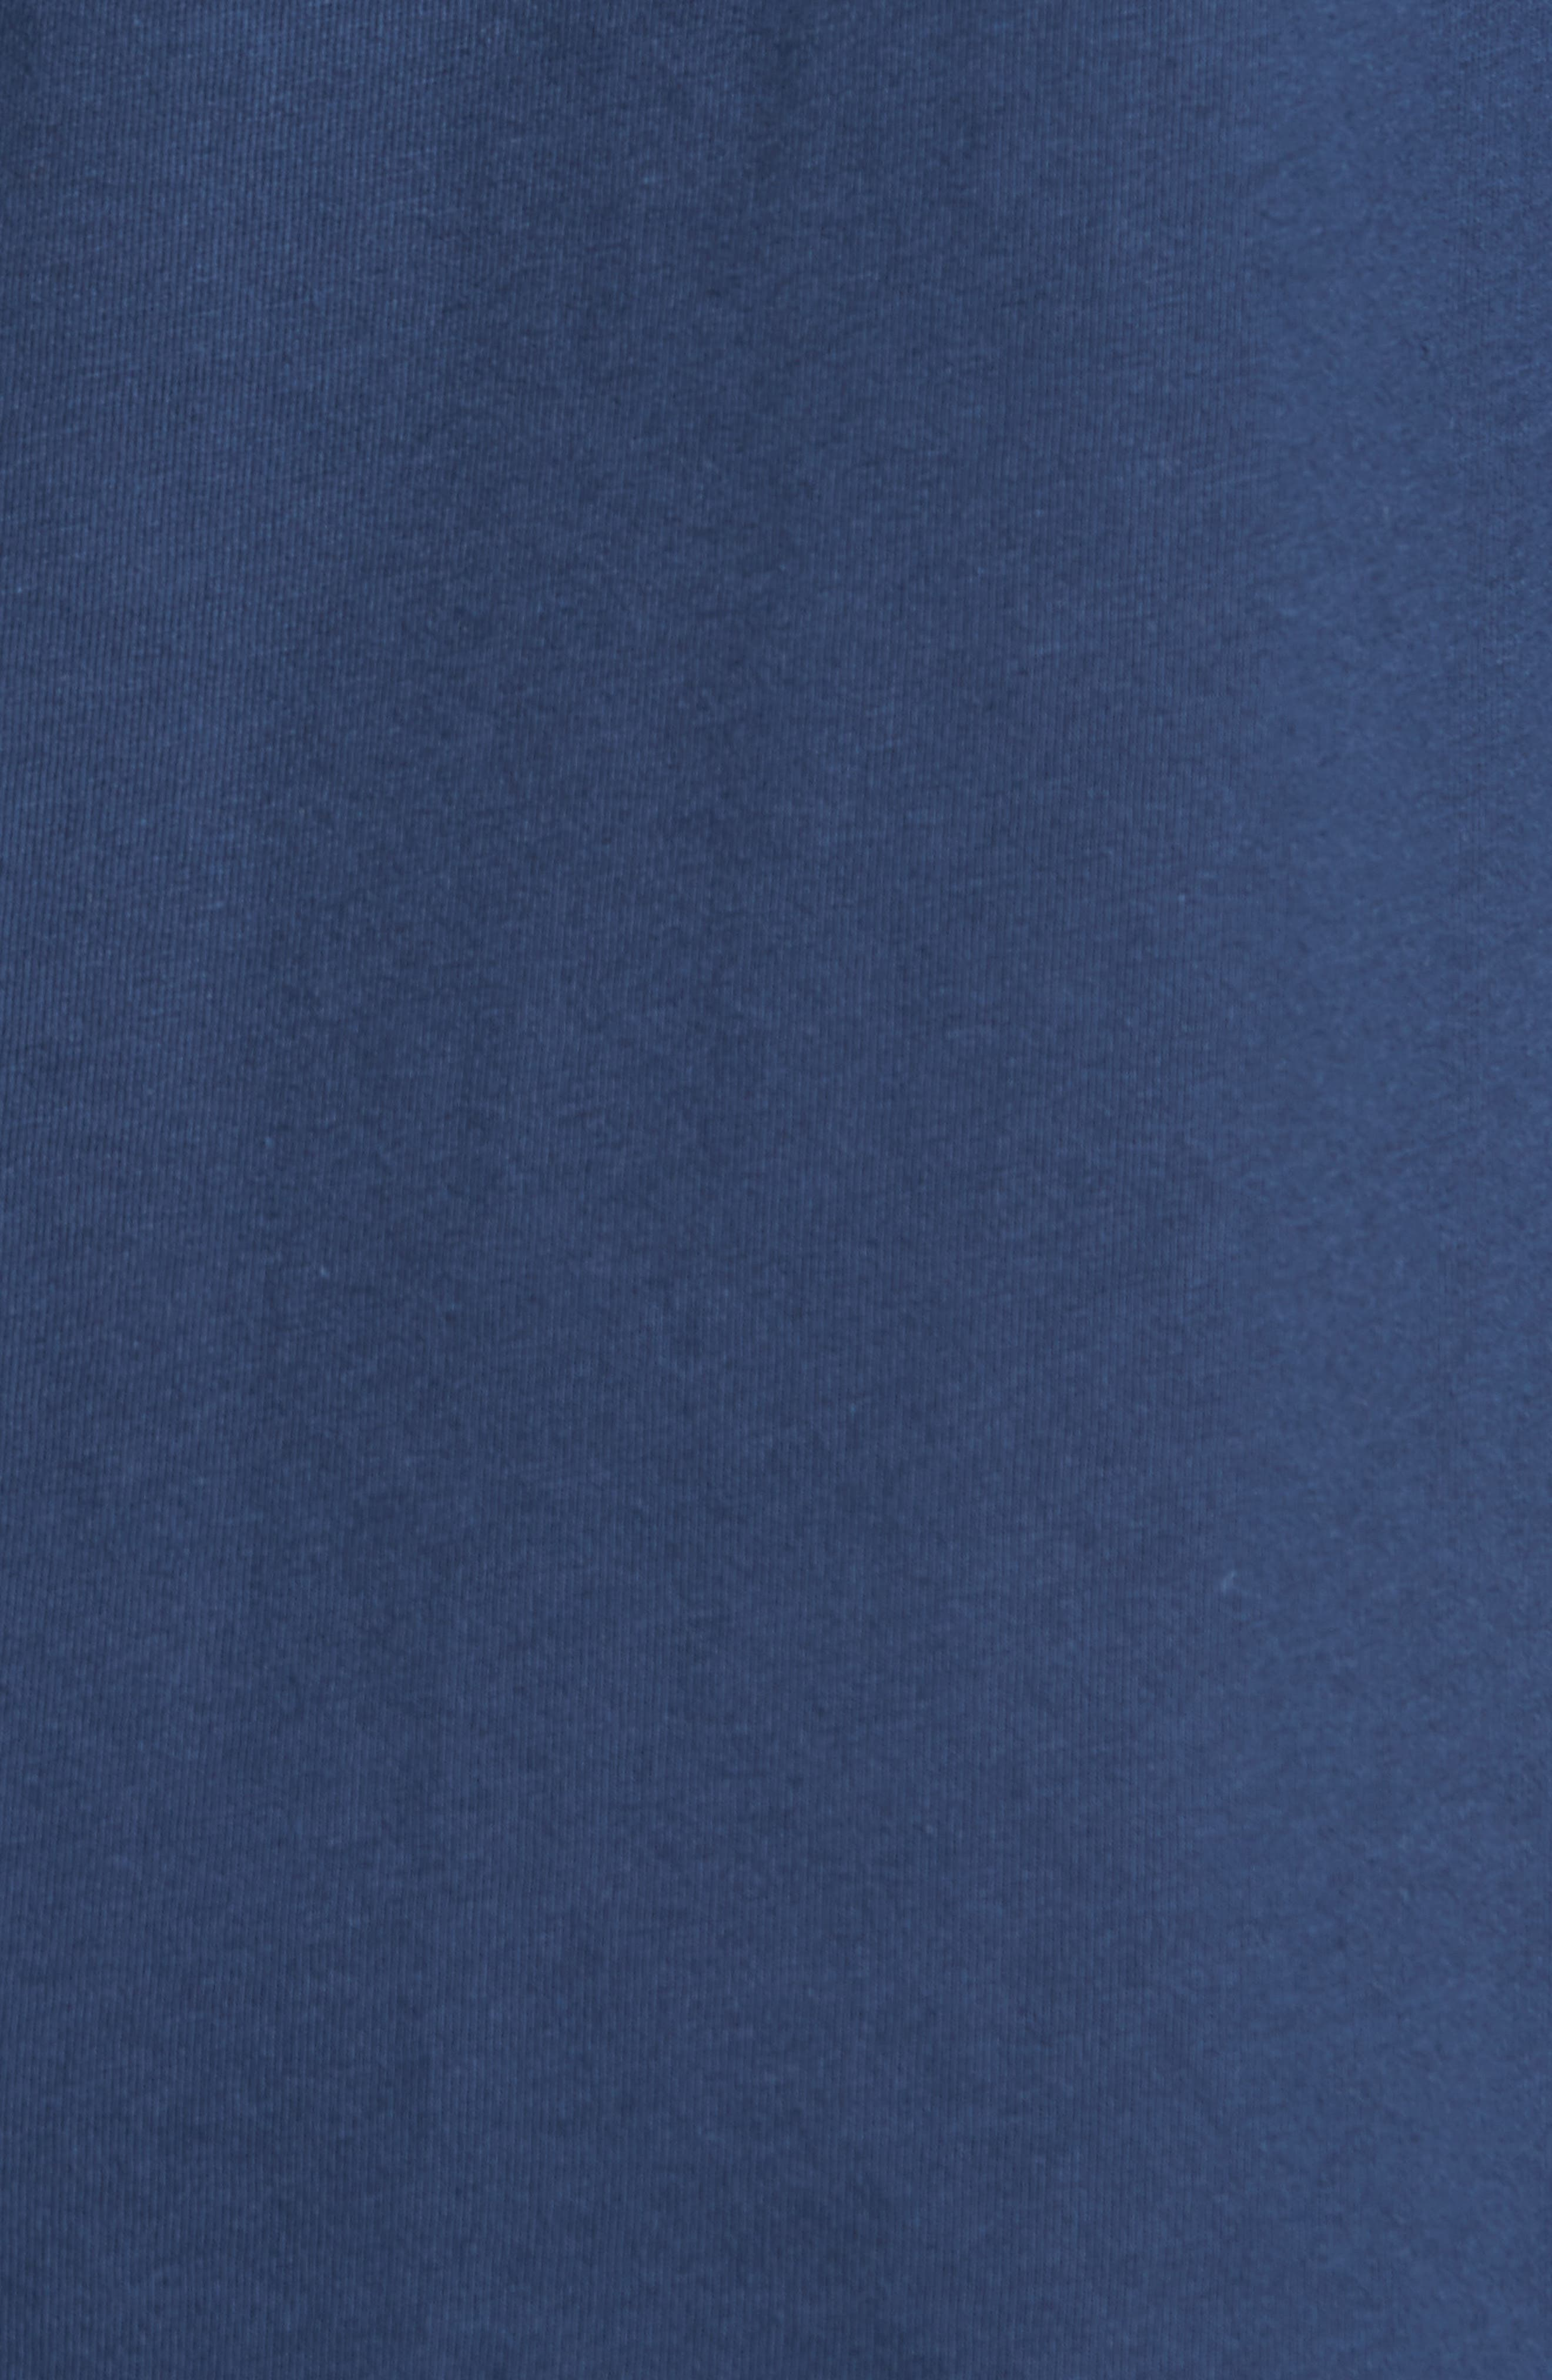 Parrot Sailing T-Shirt,                             Alternate thumbnail 5, color,                             400